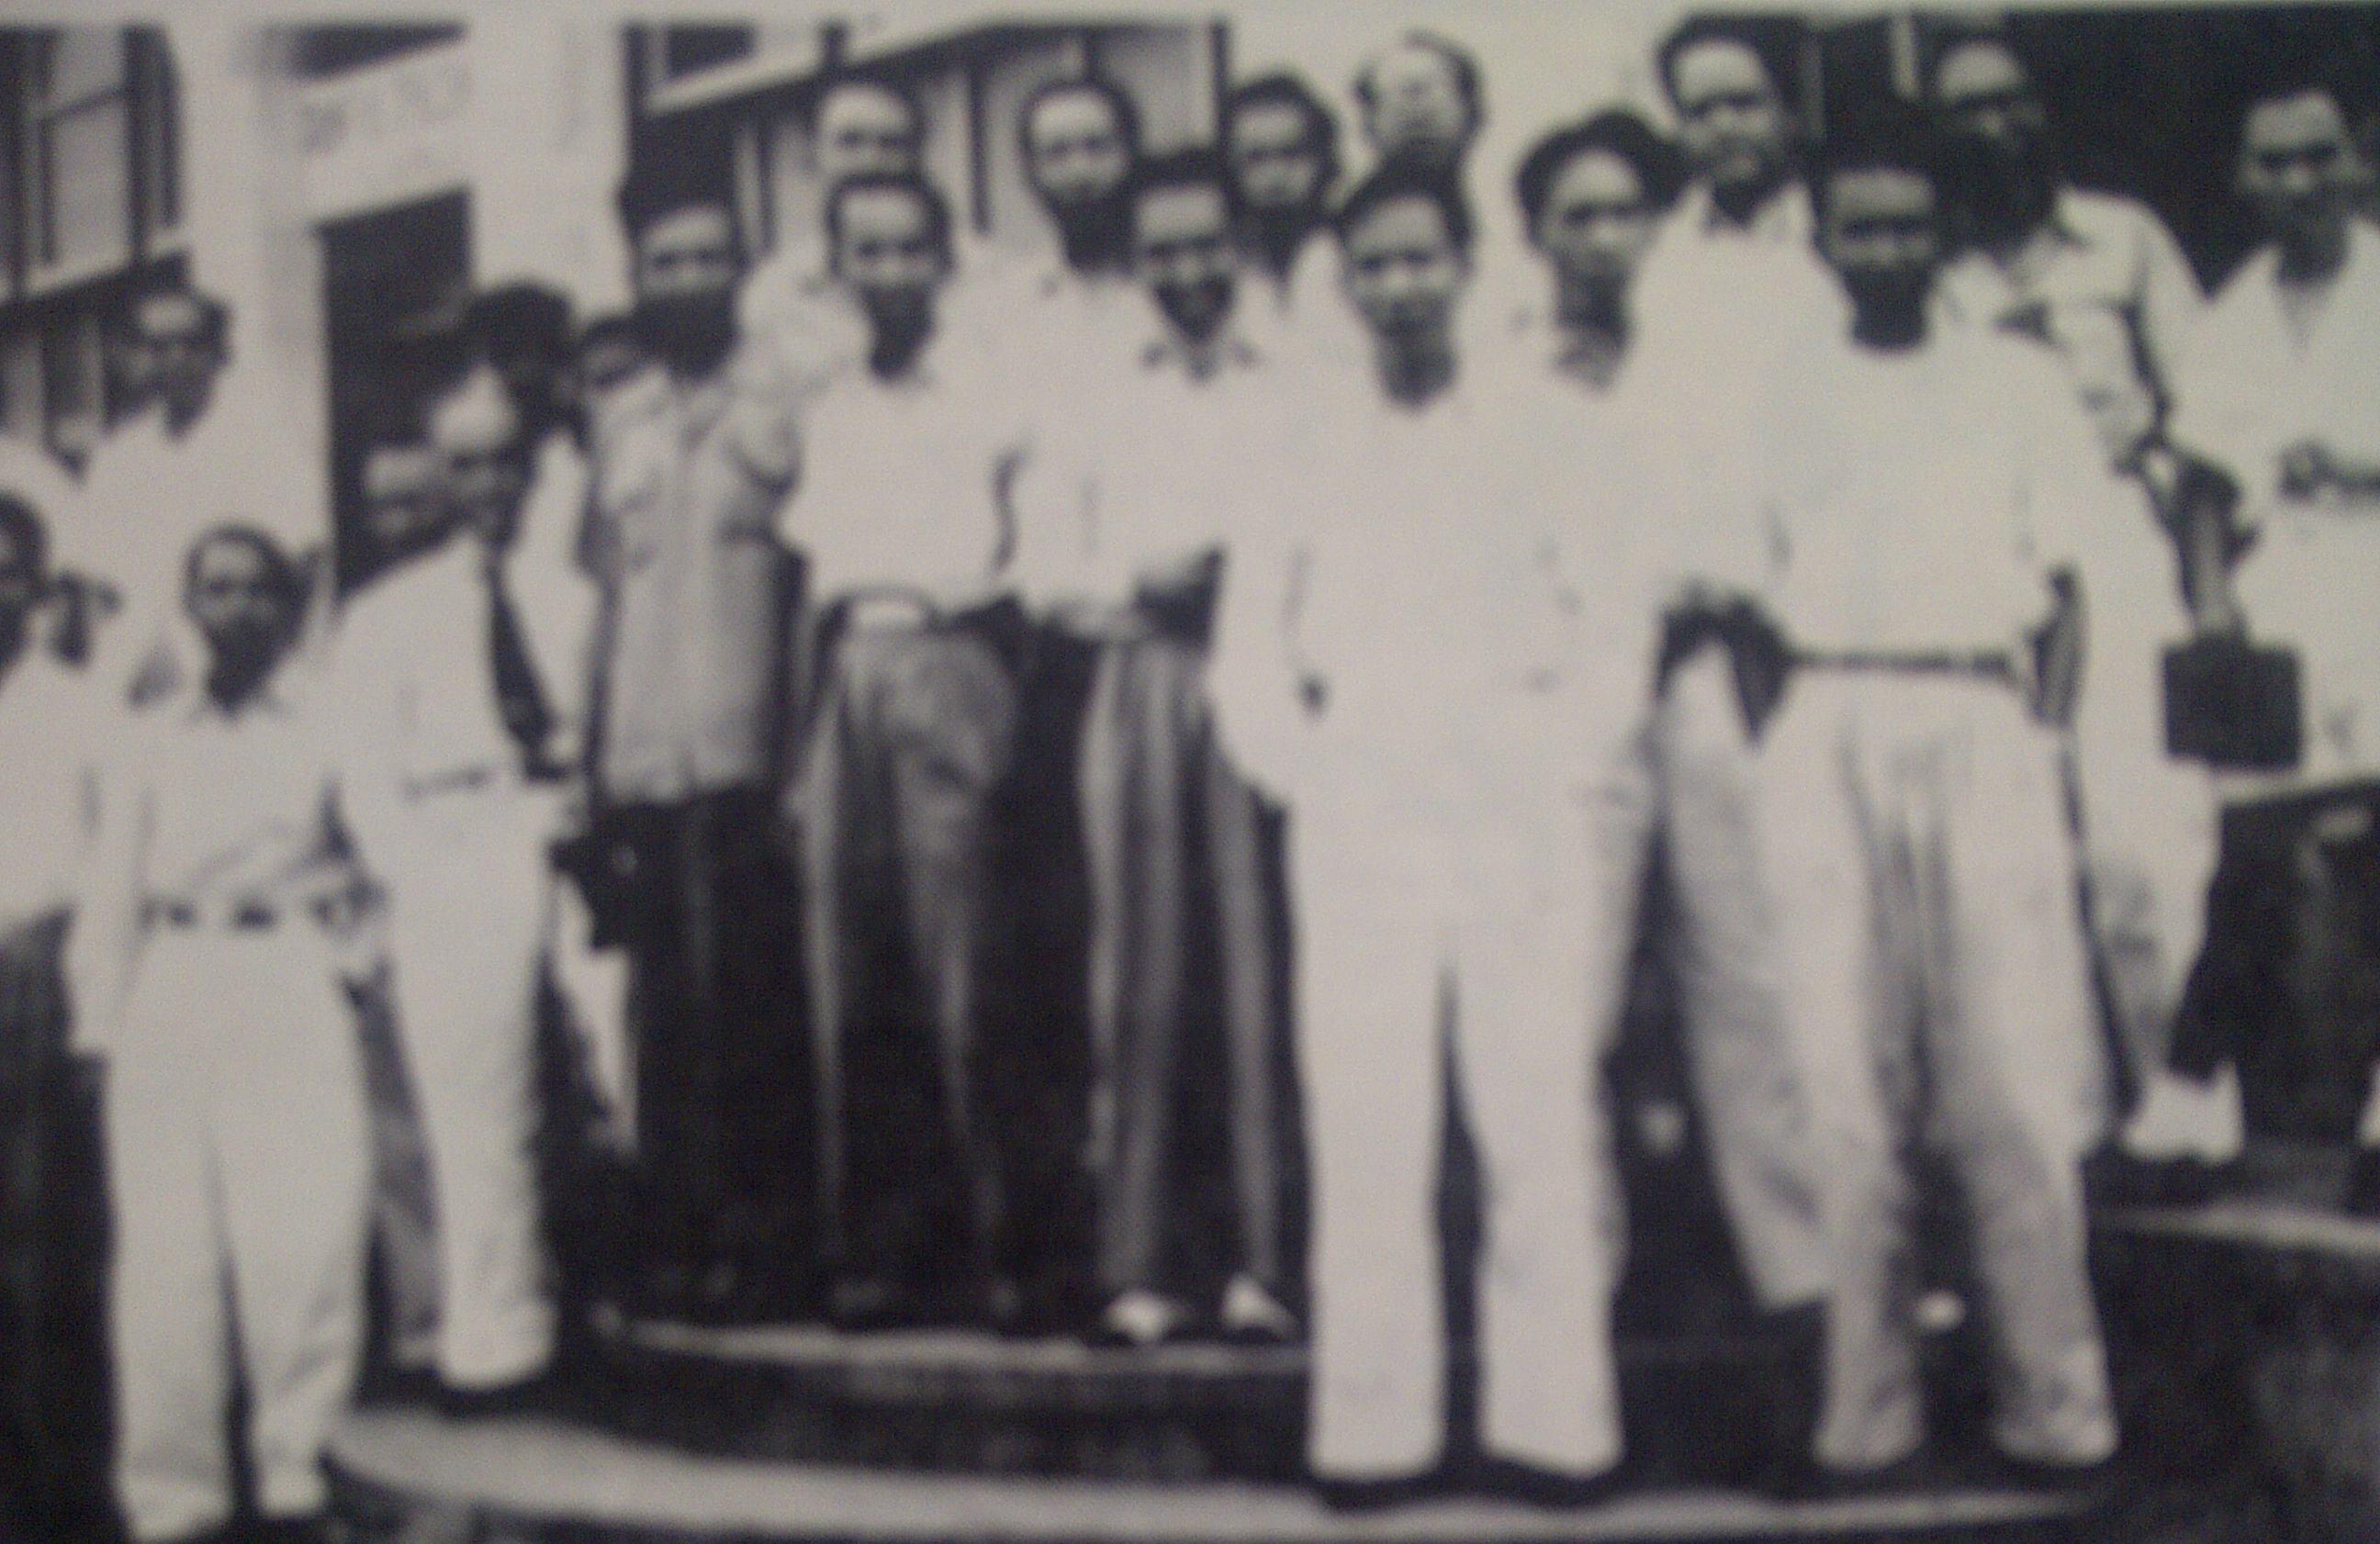 Para wartawan di Balai Wartawan PWI Surabaya yang pertama di Jalan Pahlawan 16-18 (sekarang sudah dibongkar dan dibangun Gedung Bapeprov Jatim)